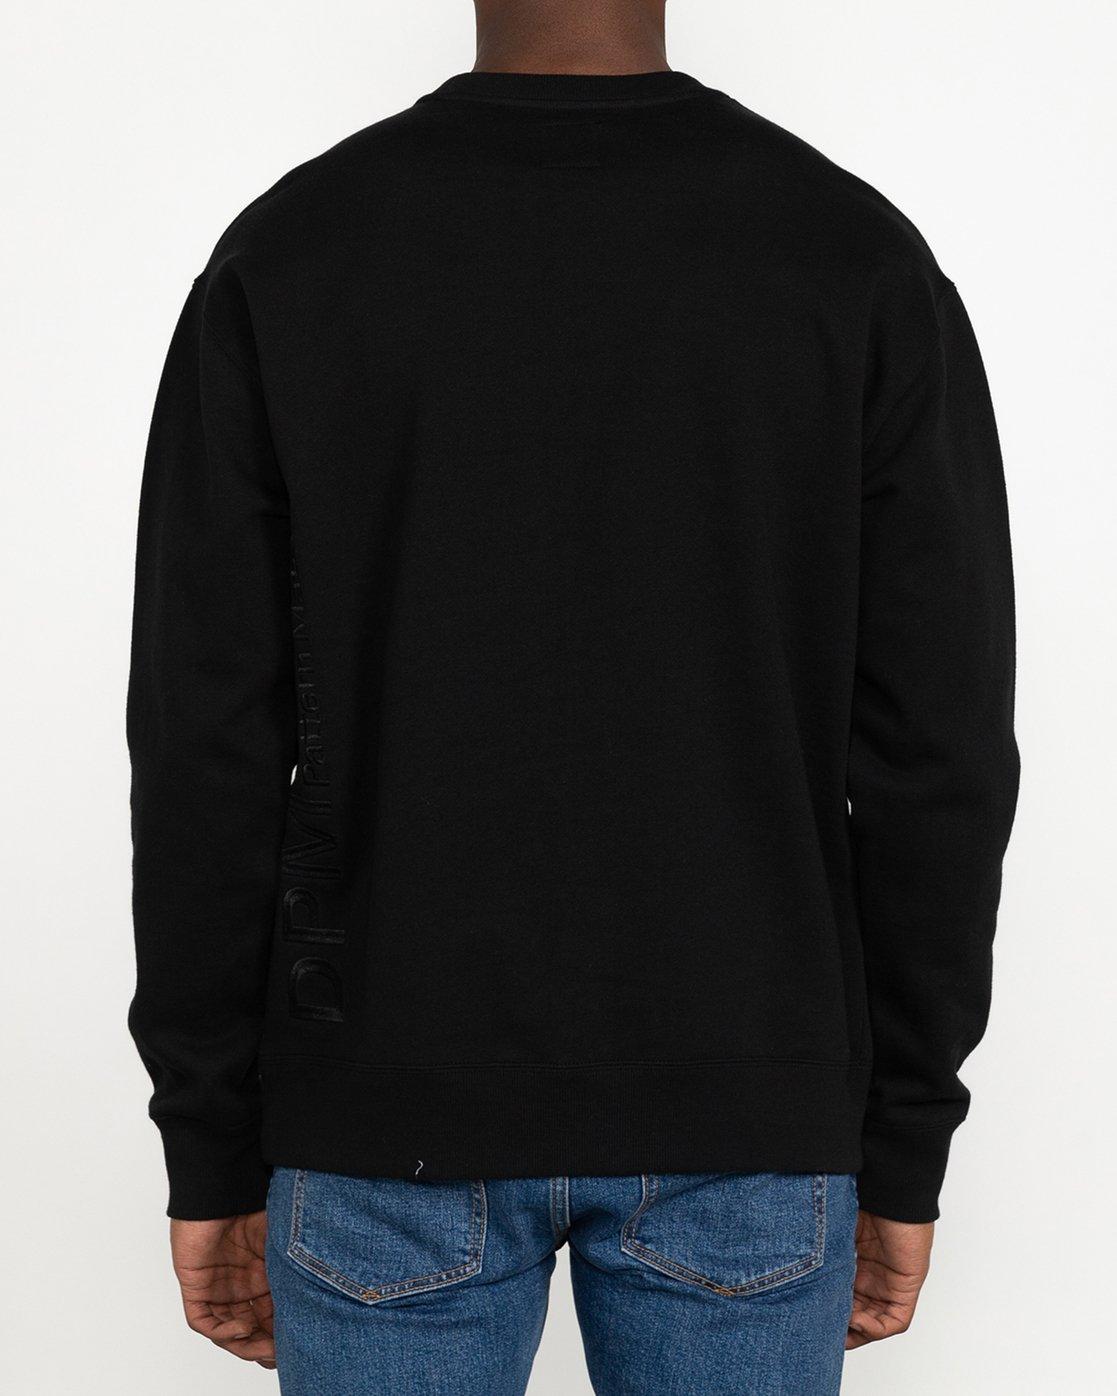 7 DPM - Sweatshirt for Men Black U1CRRFRVF0 RVCA